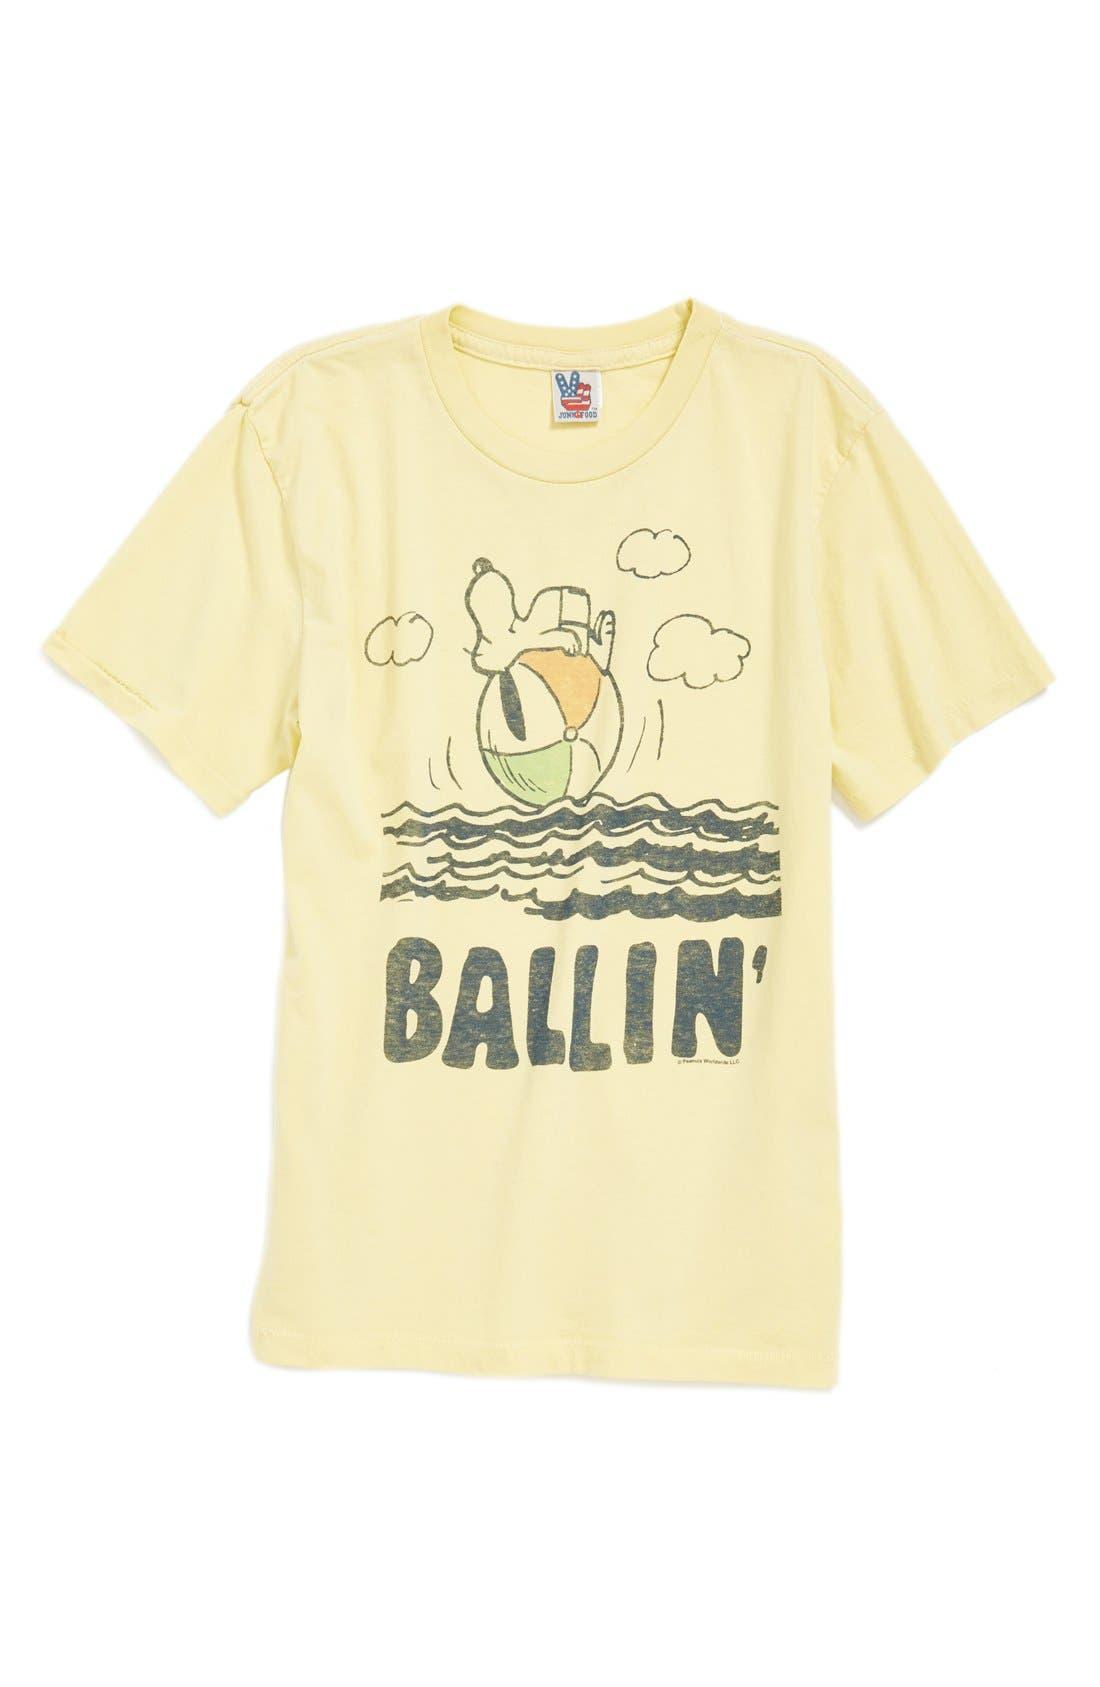 Alternate Image 1 Selected - Junk Food 'Snoopy Ballin'' Cotton Jersey T-Shirt (Toddler Boys & Little Boys)